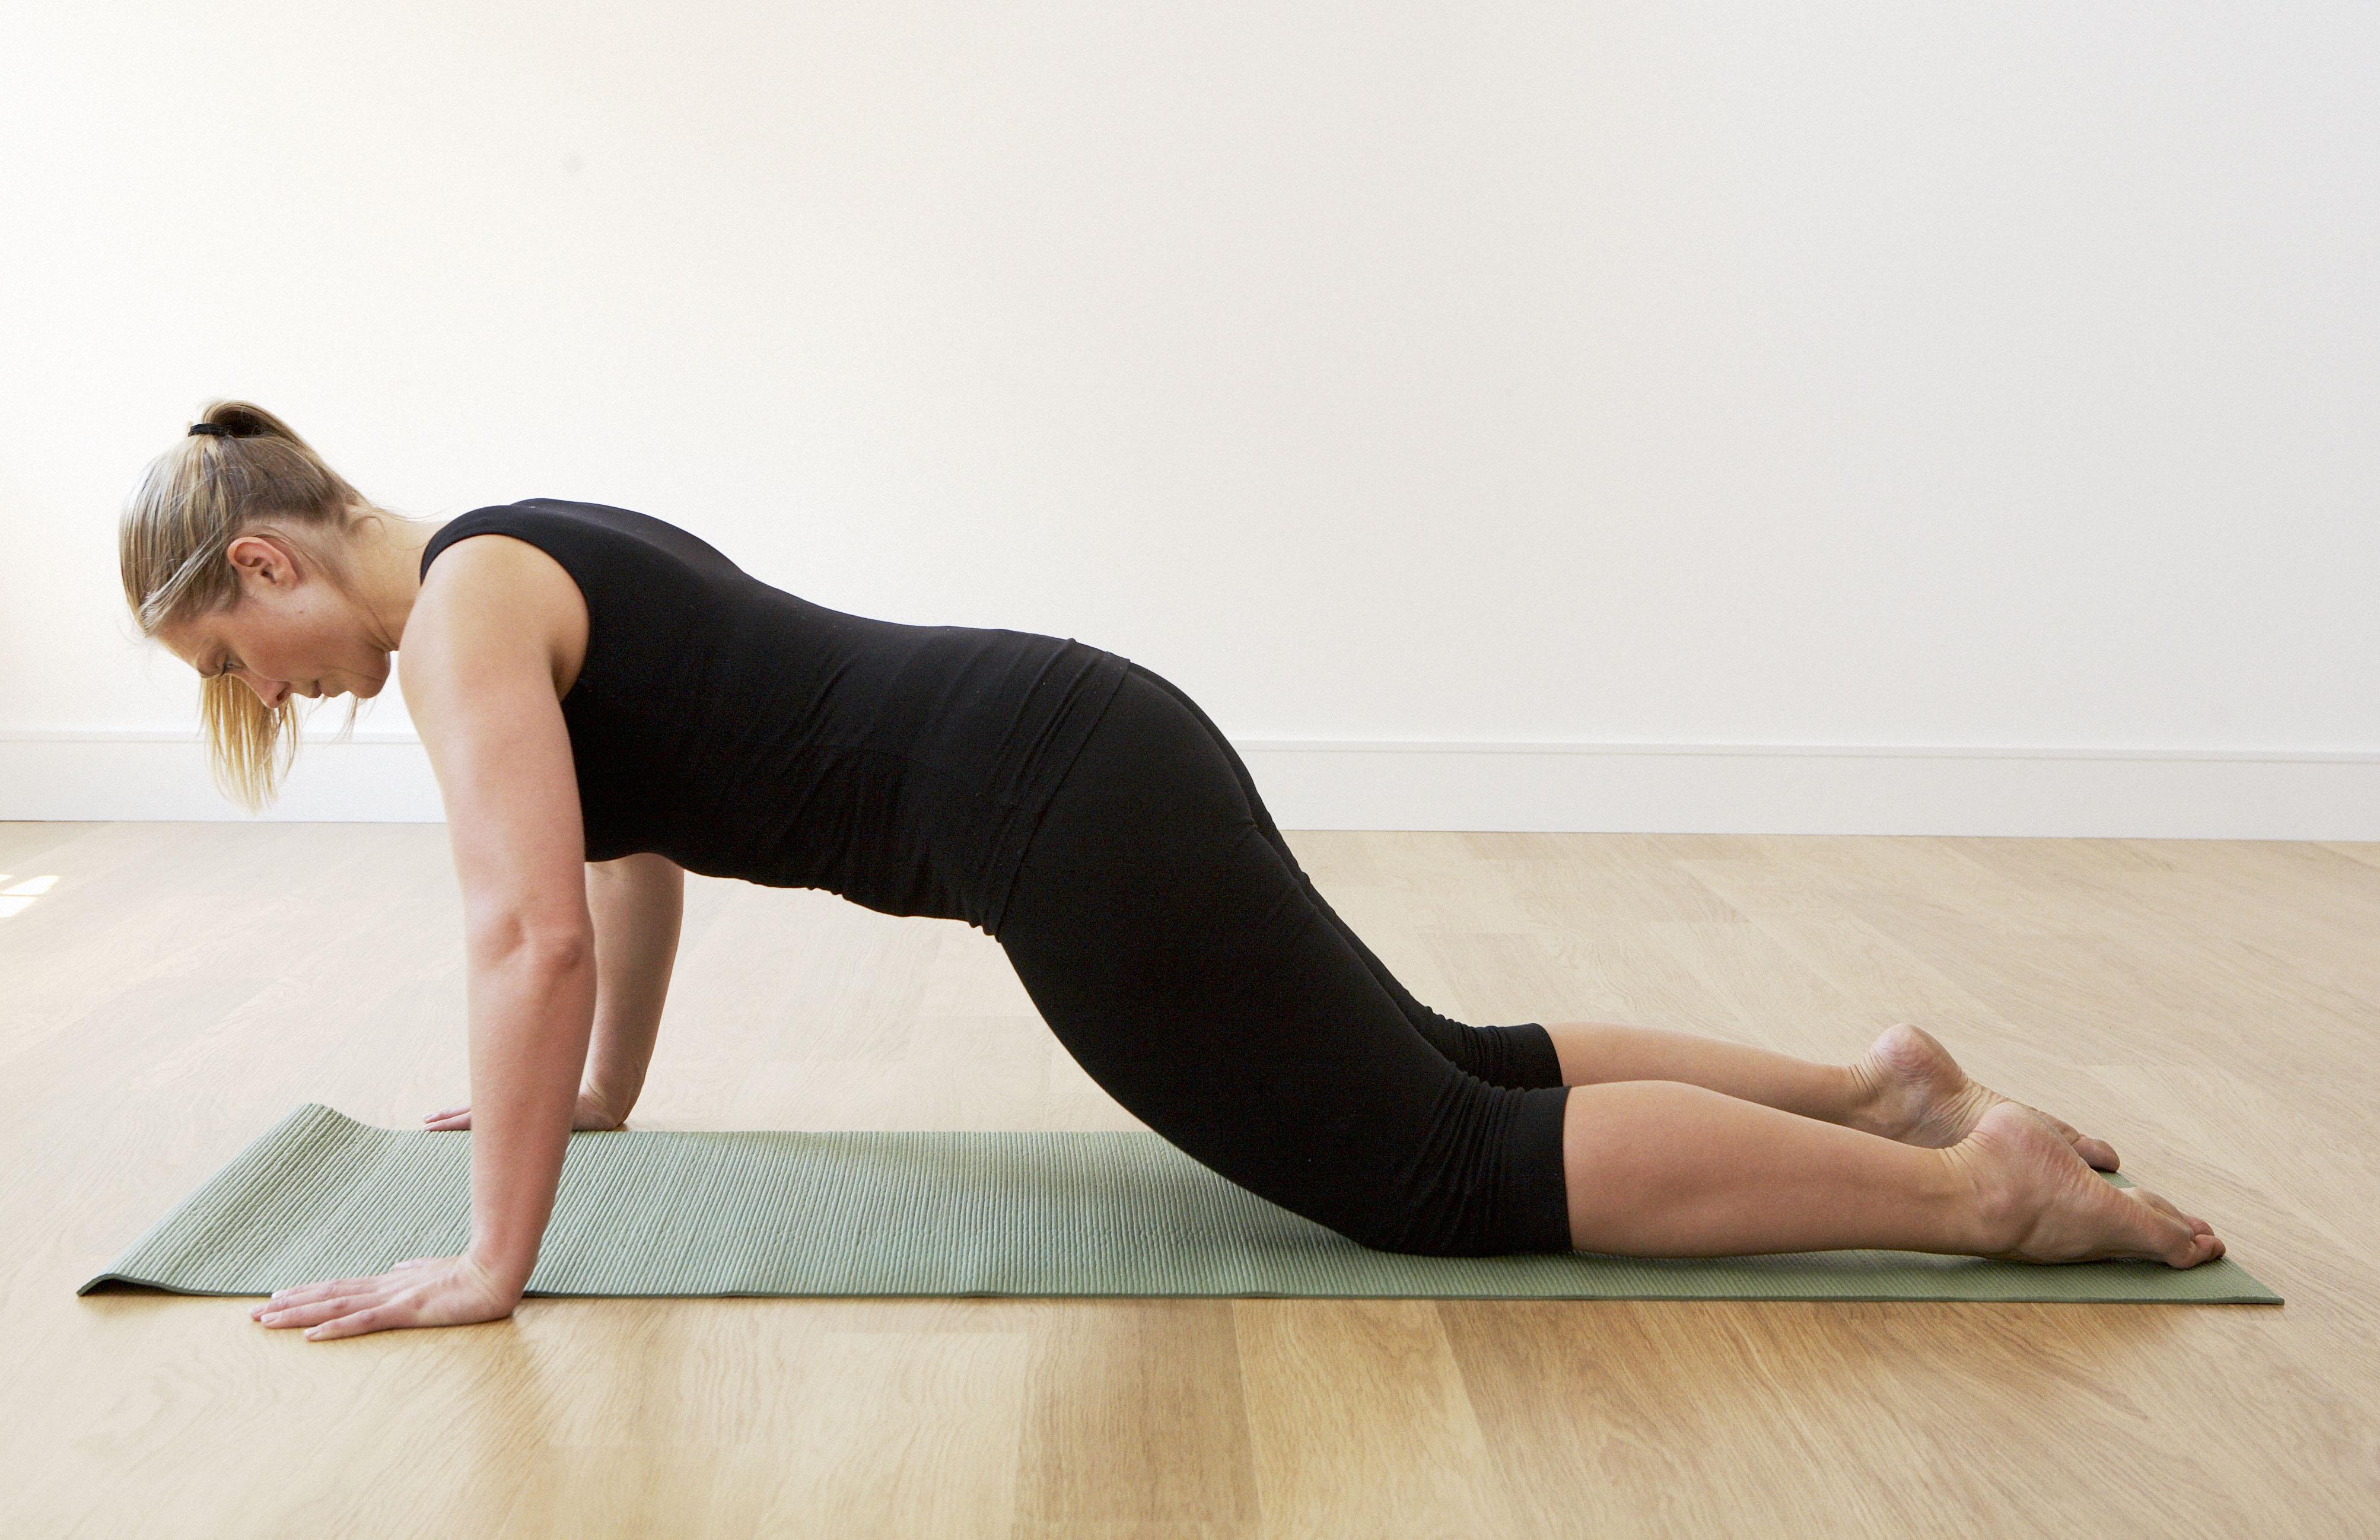 Level 2 plank